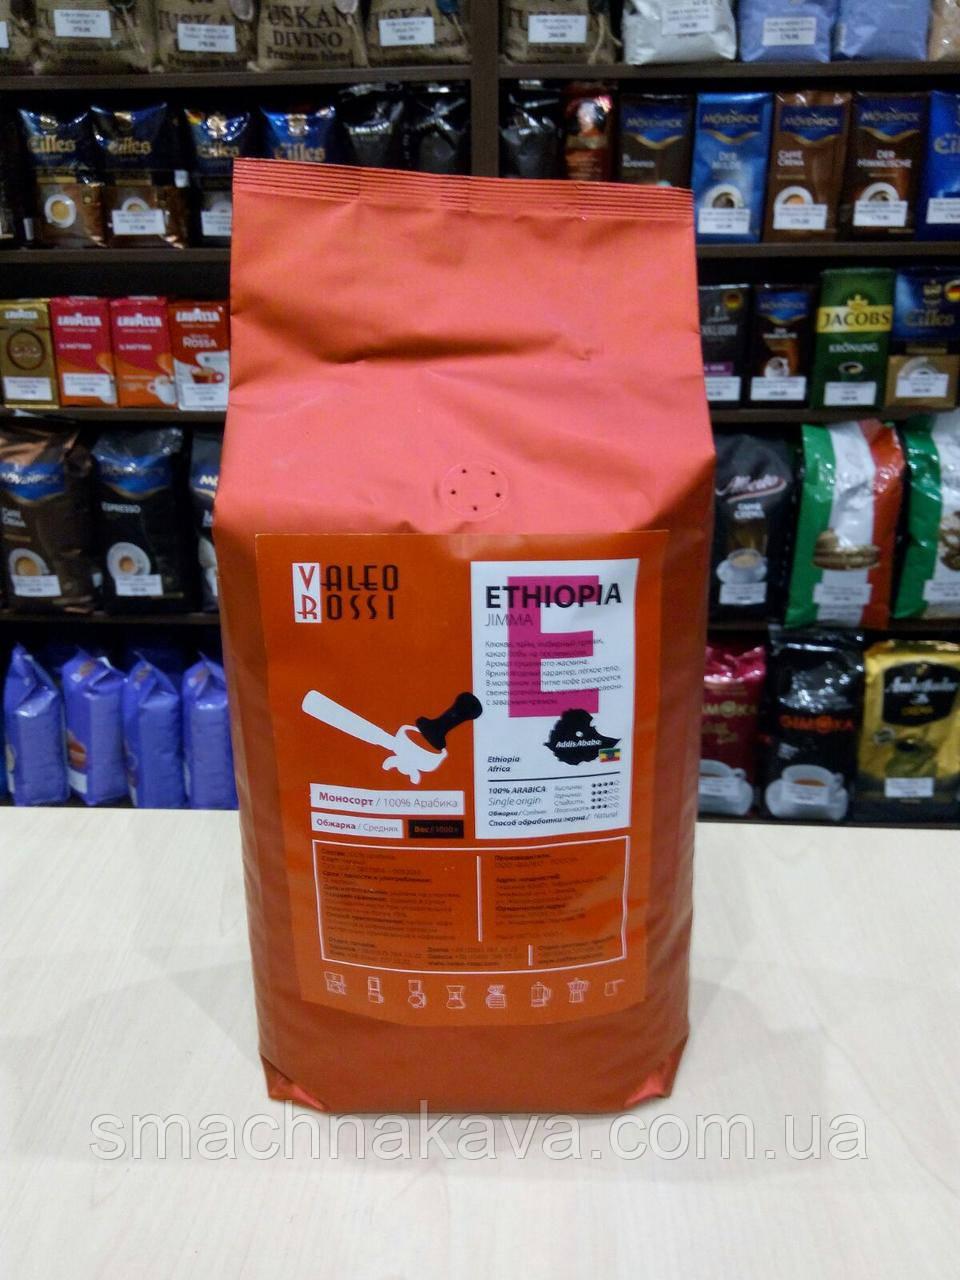 Кофе в зернах Valeo Rossi Ethiopia Jimma